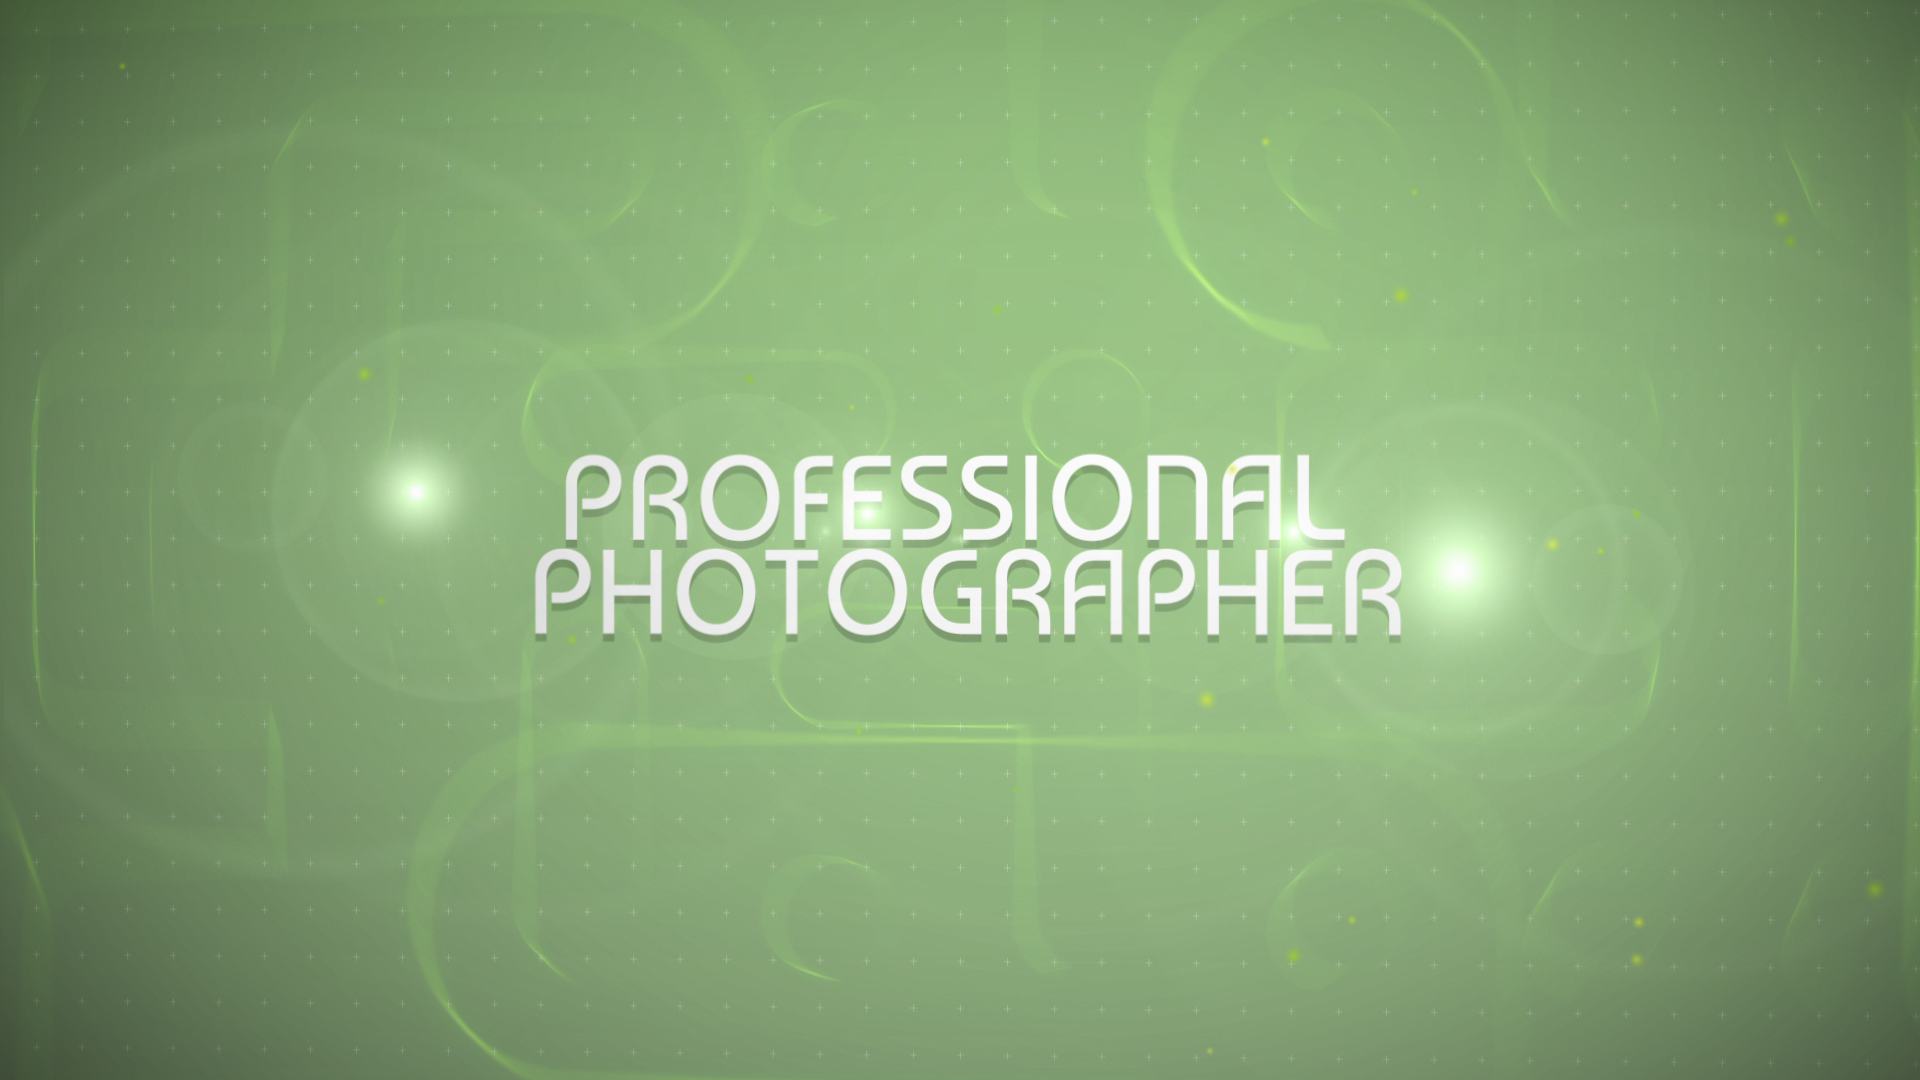 Заставка After Effects на тему портфоліо фотографа  №47309